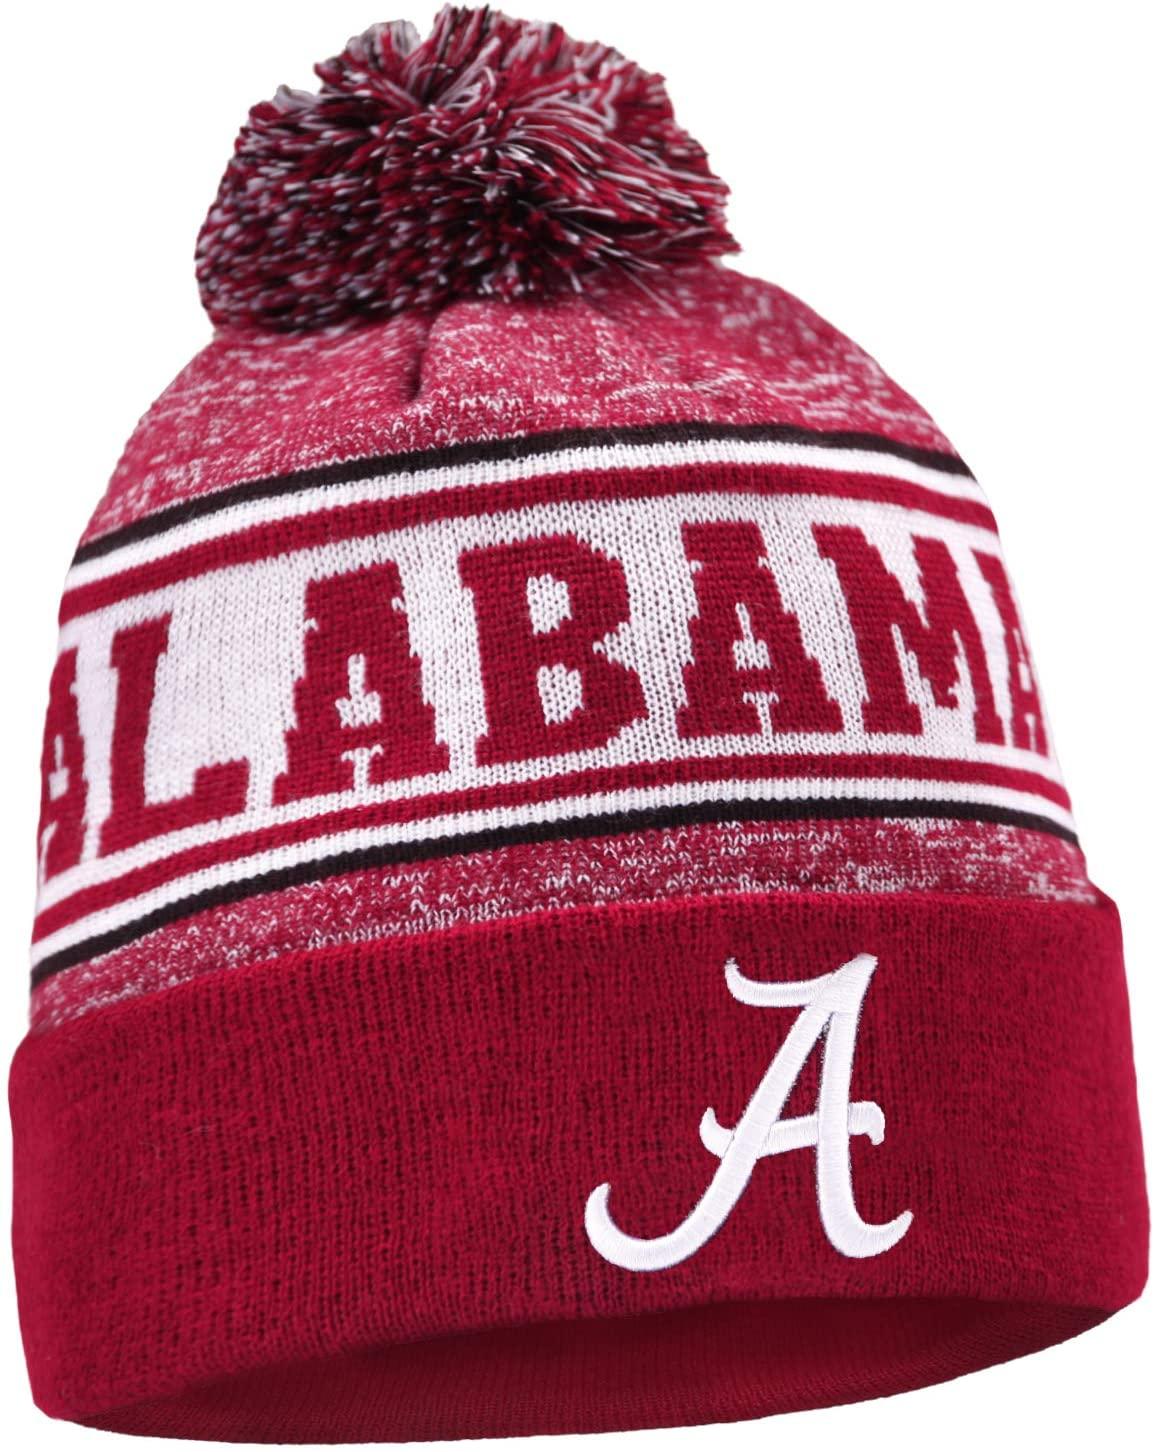 CANDICE NCAA Logo Hats Winter Knit Cuffed Stylish Beanie Knit Cap Sport Hats Fashion Toque Cap